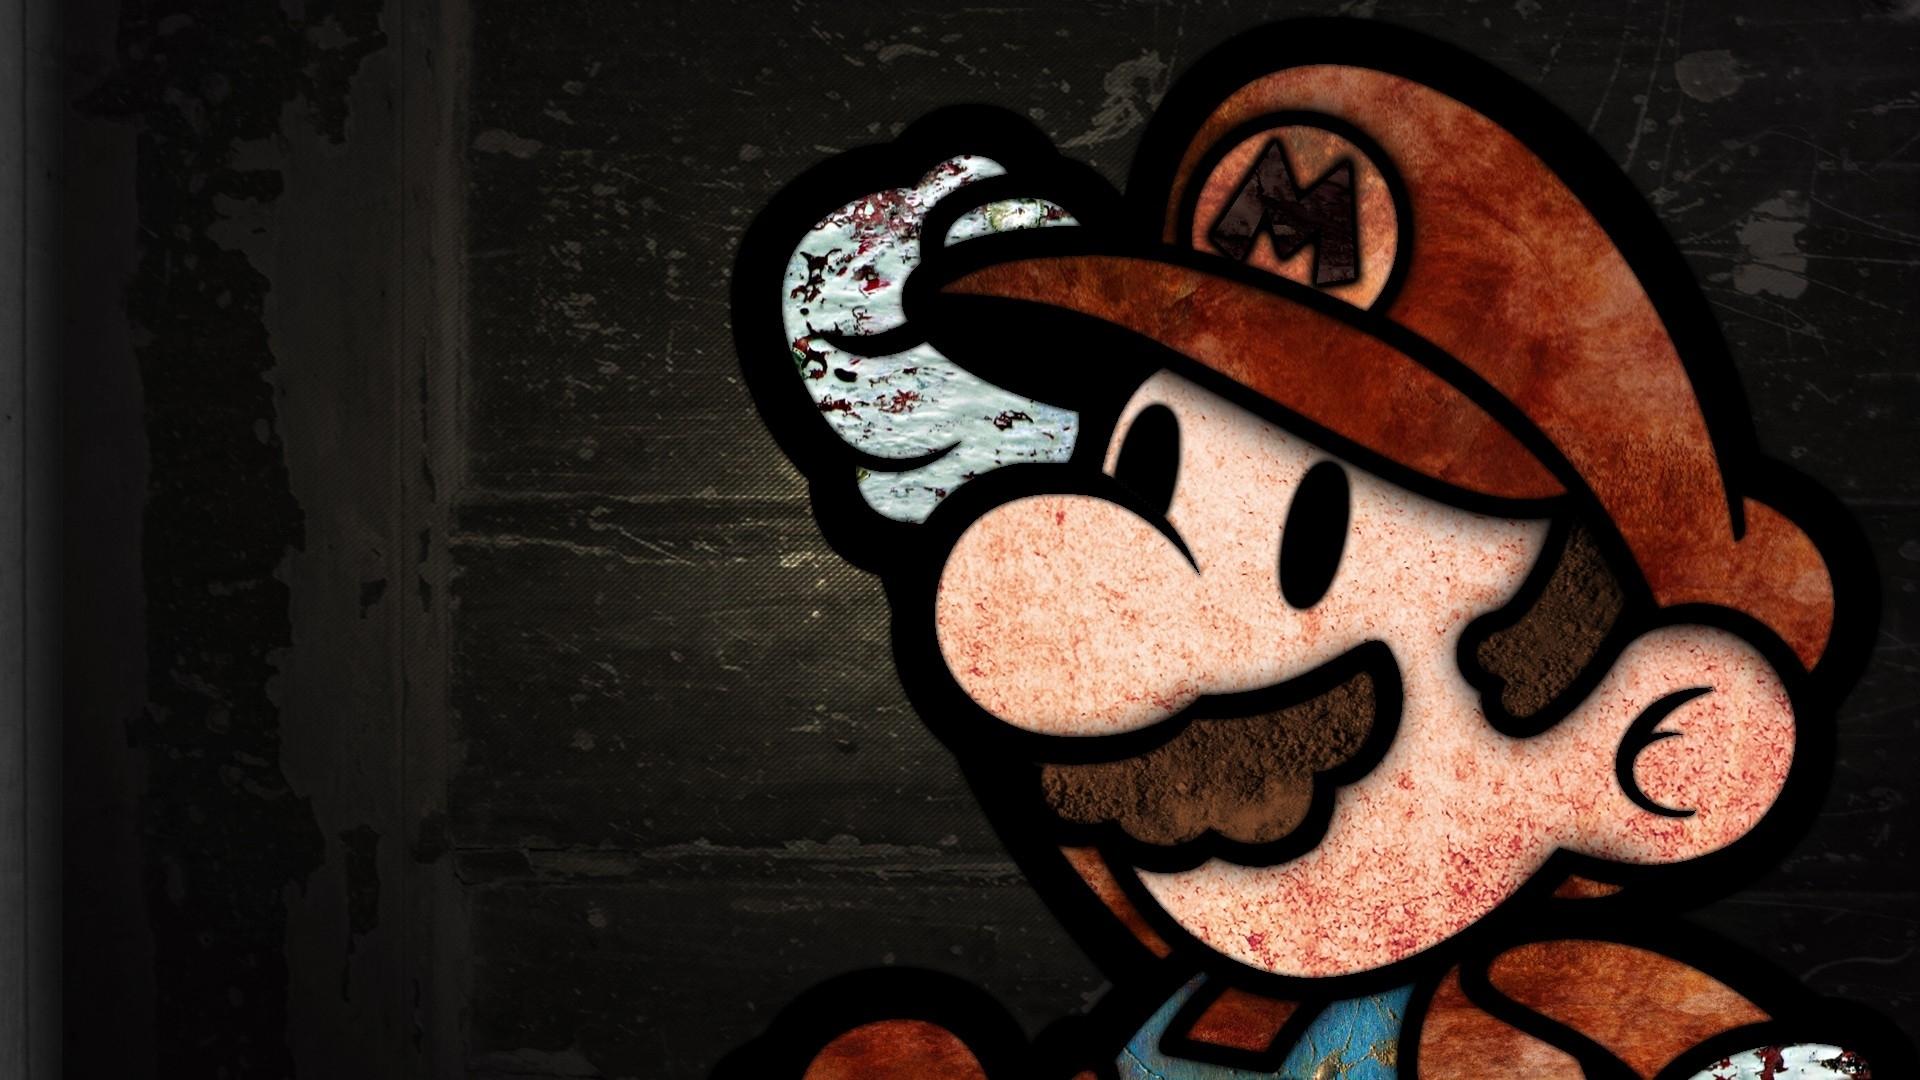 fonds d'écran jeu vidéo mario bros - mario bros vidéo game wallpapers